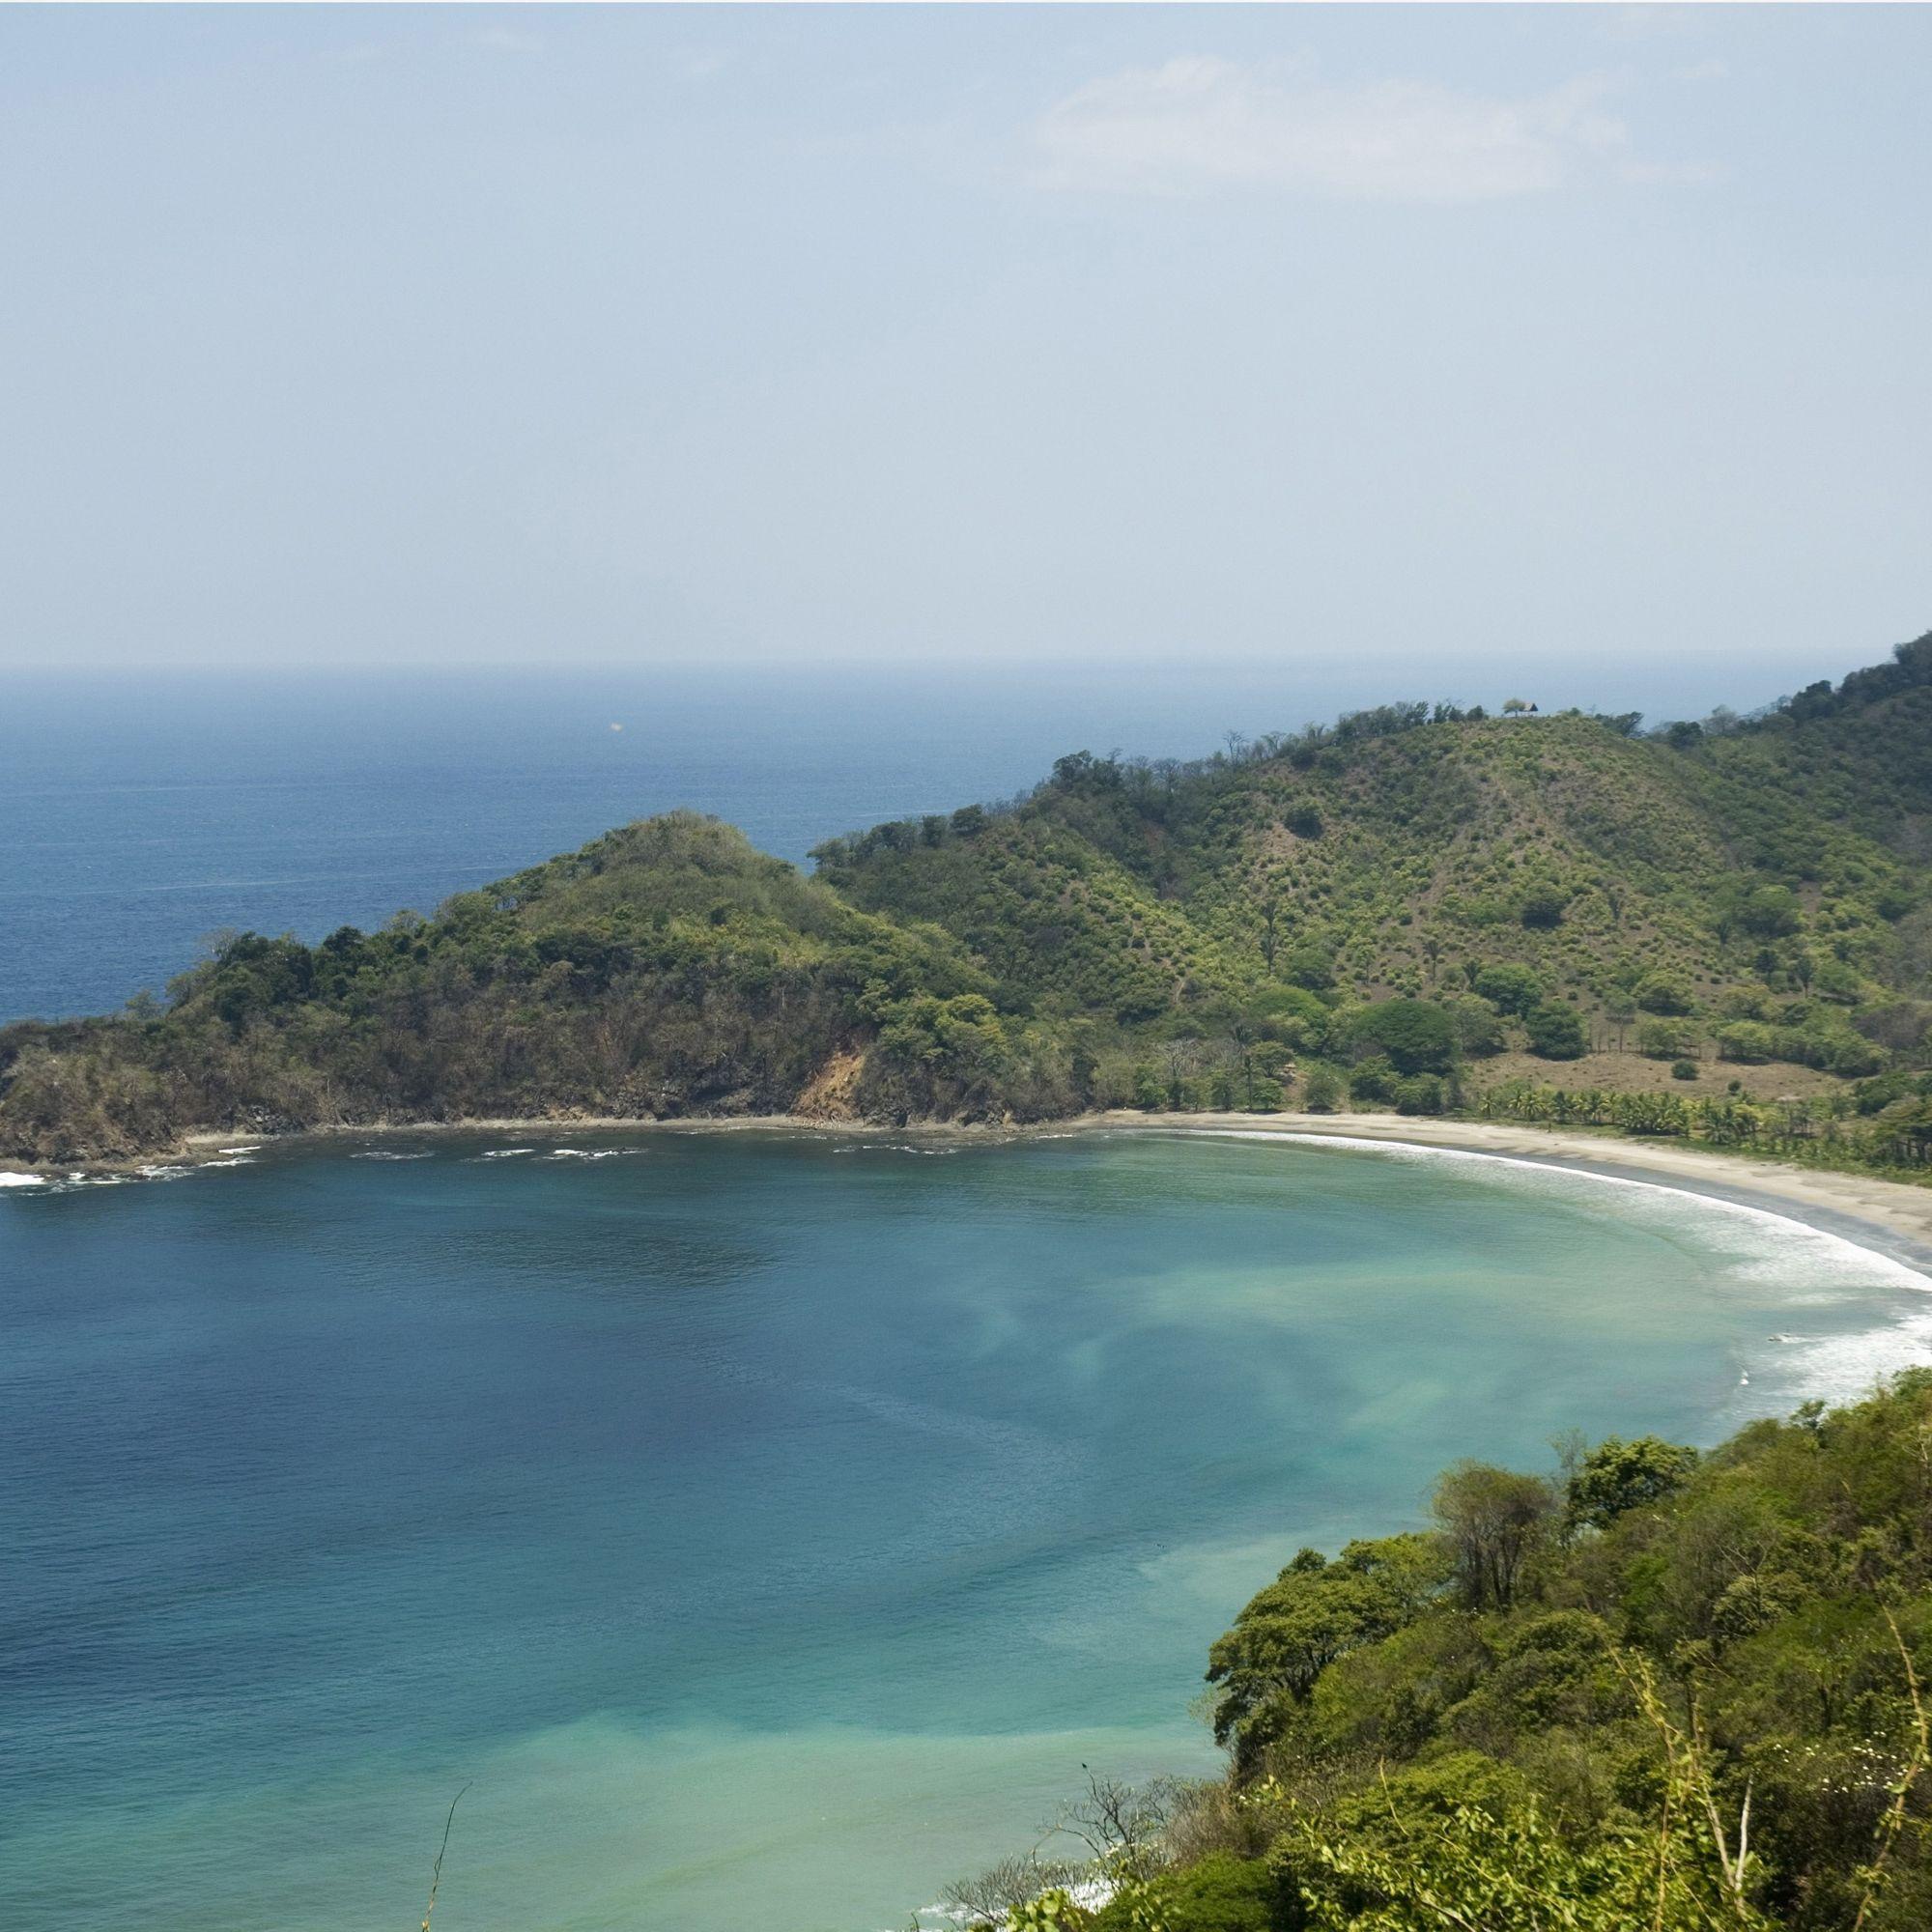 Punta Islita, Nicoya Pennisula, Pacific Coast, Costa Rica